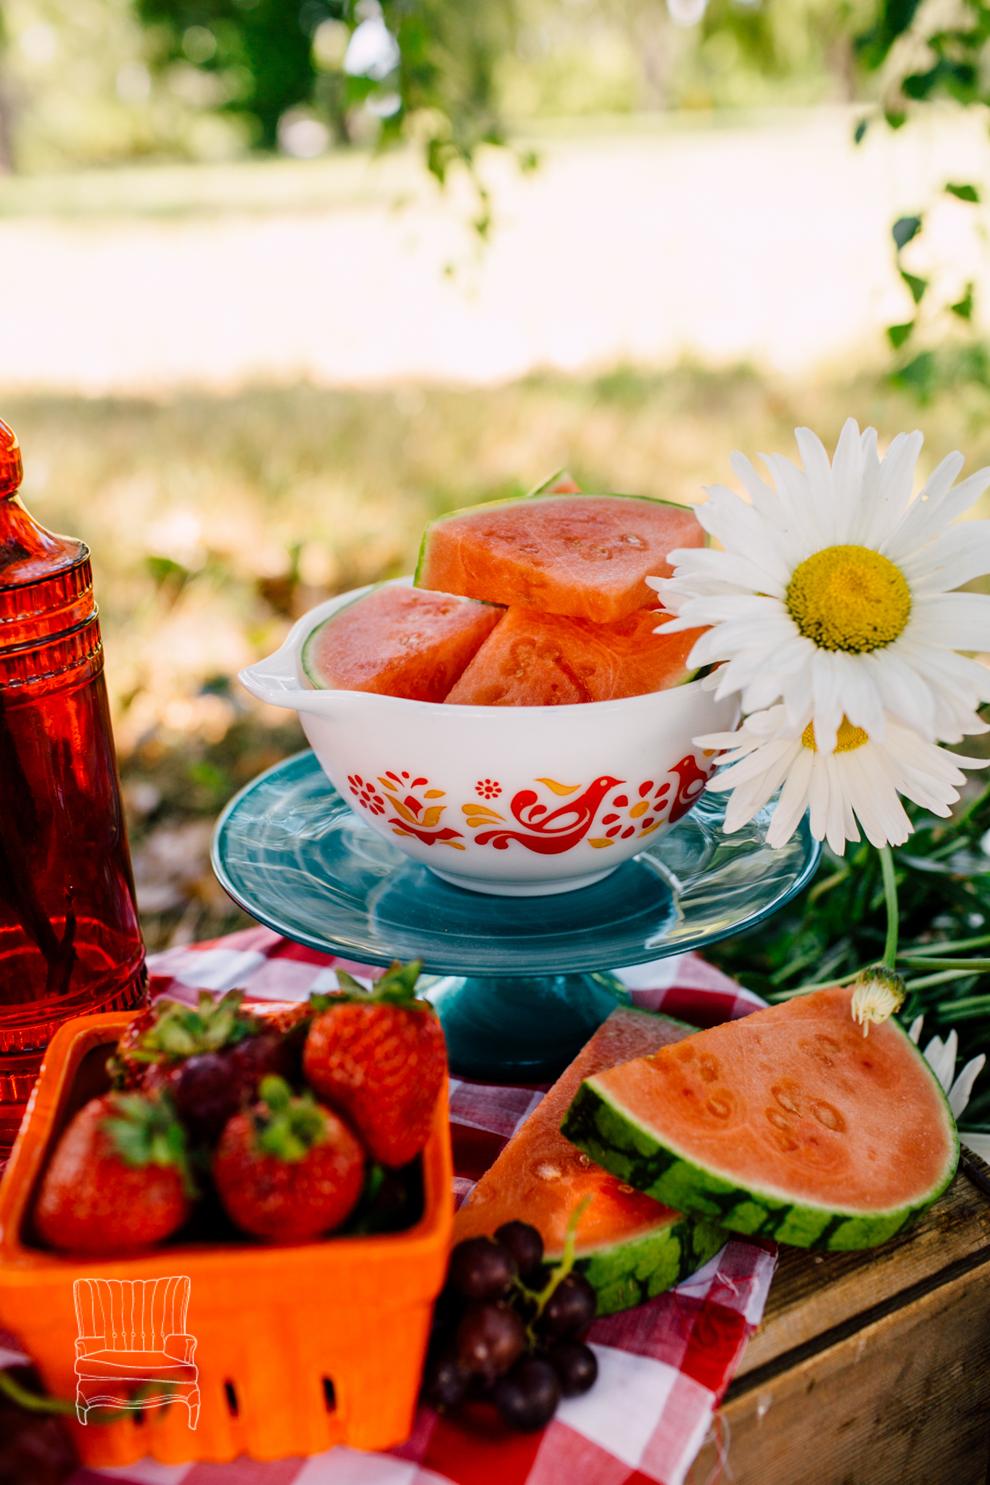 005-bellingham-summer-mini-session-fruity-styled-katheryn-moran-photography.jpg